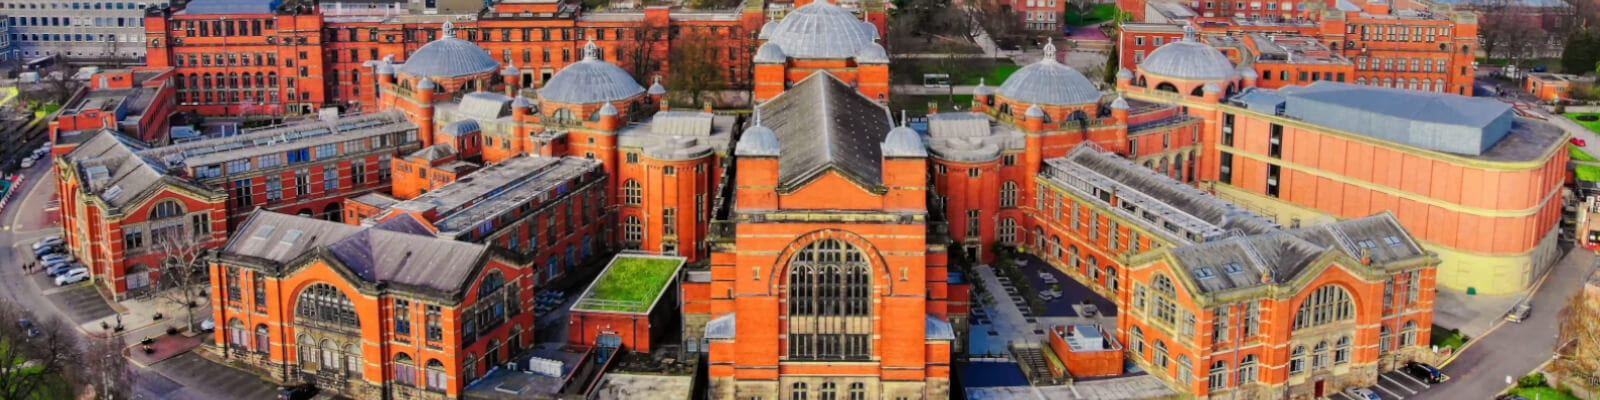 Birmingham Buy-to-Let